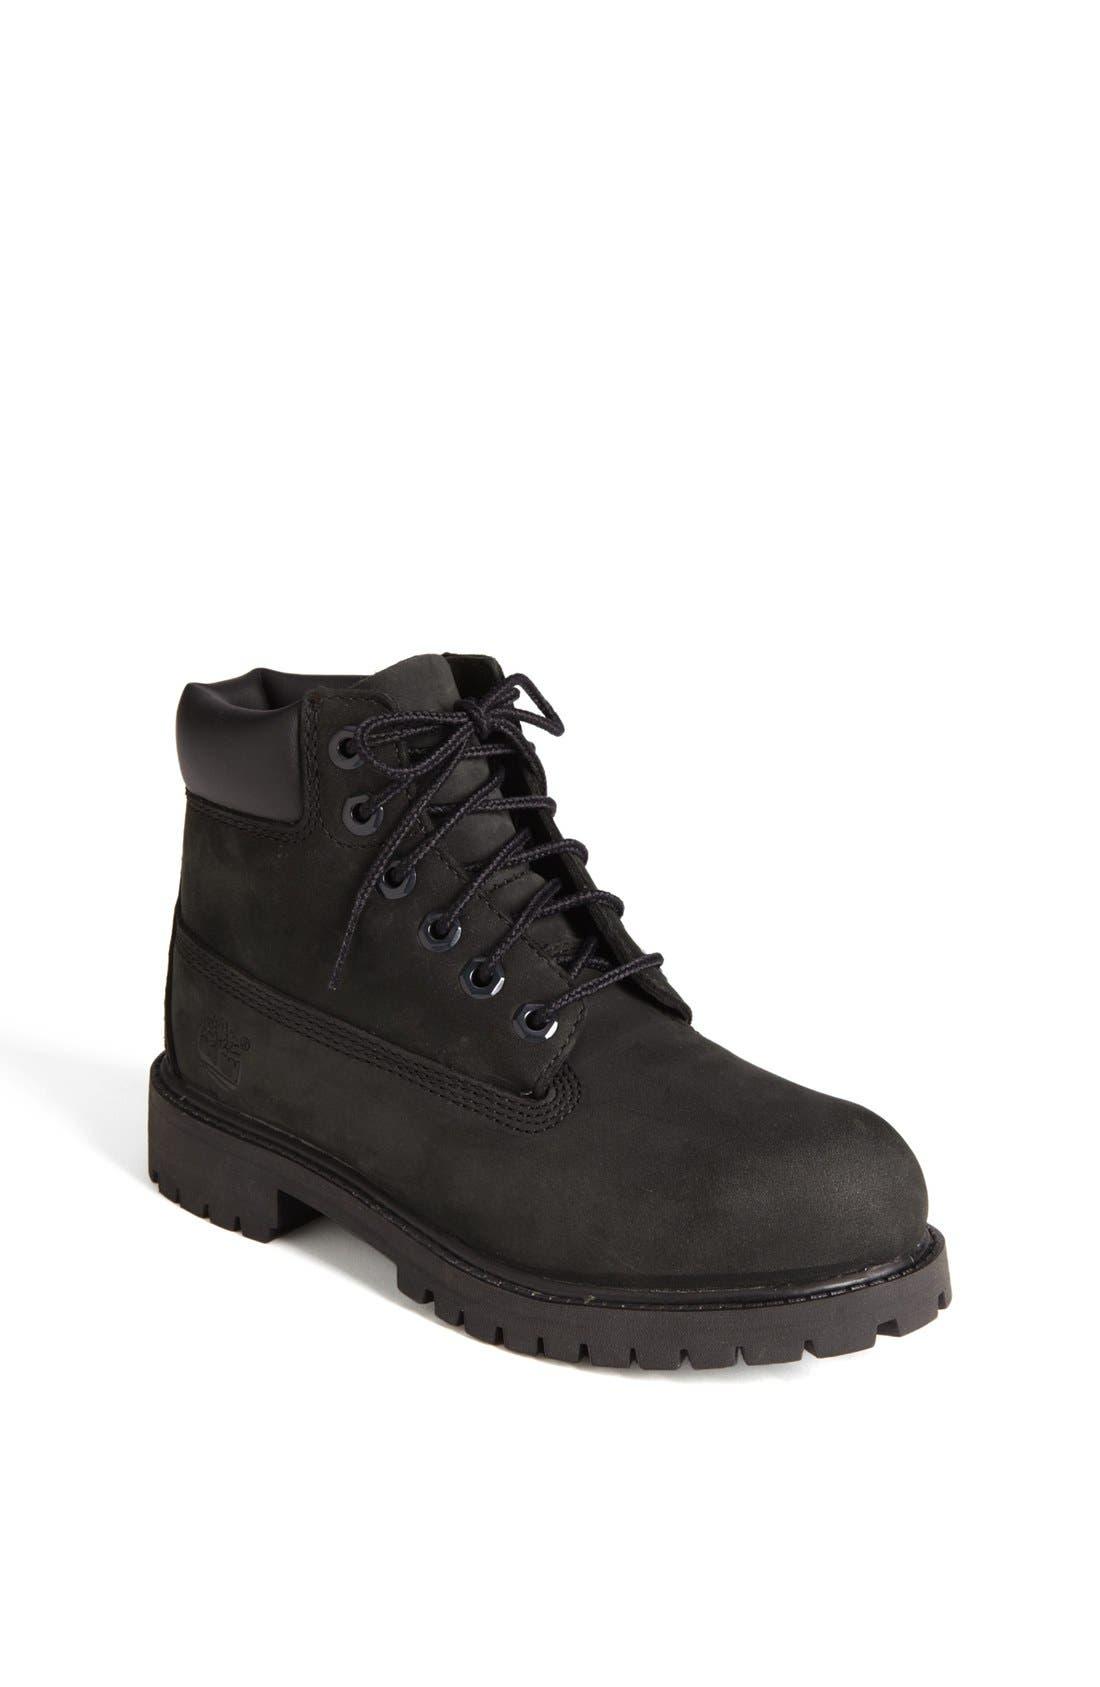 \u00276 Inch Premium\u0027 Waterproof Boot